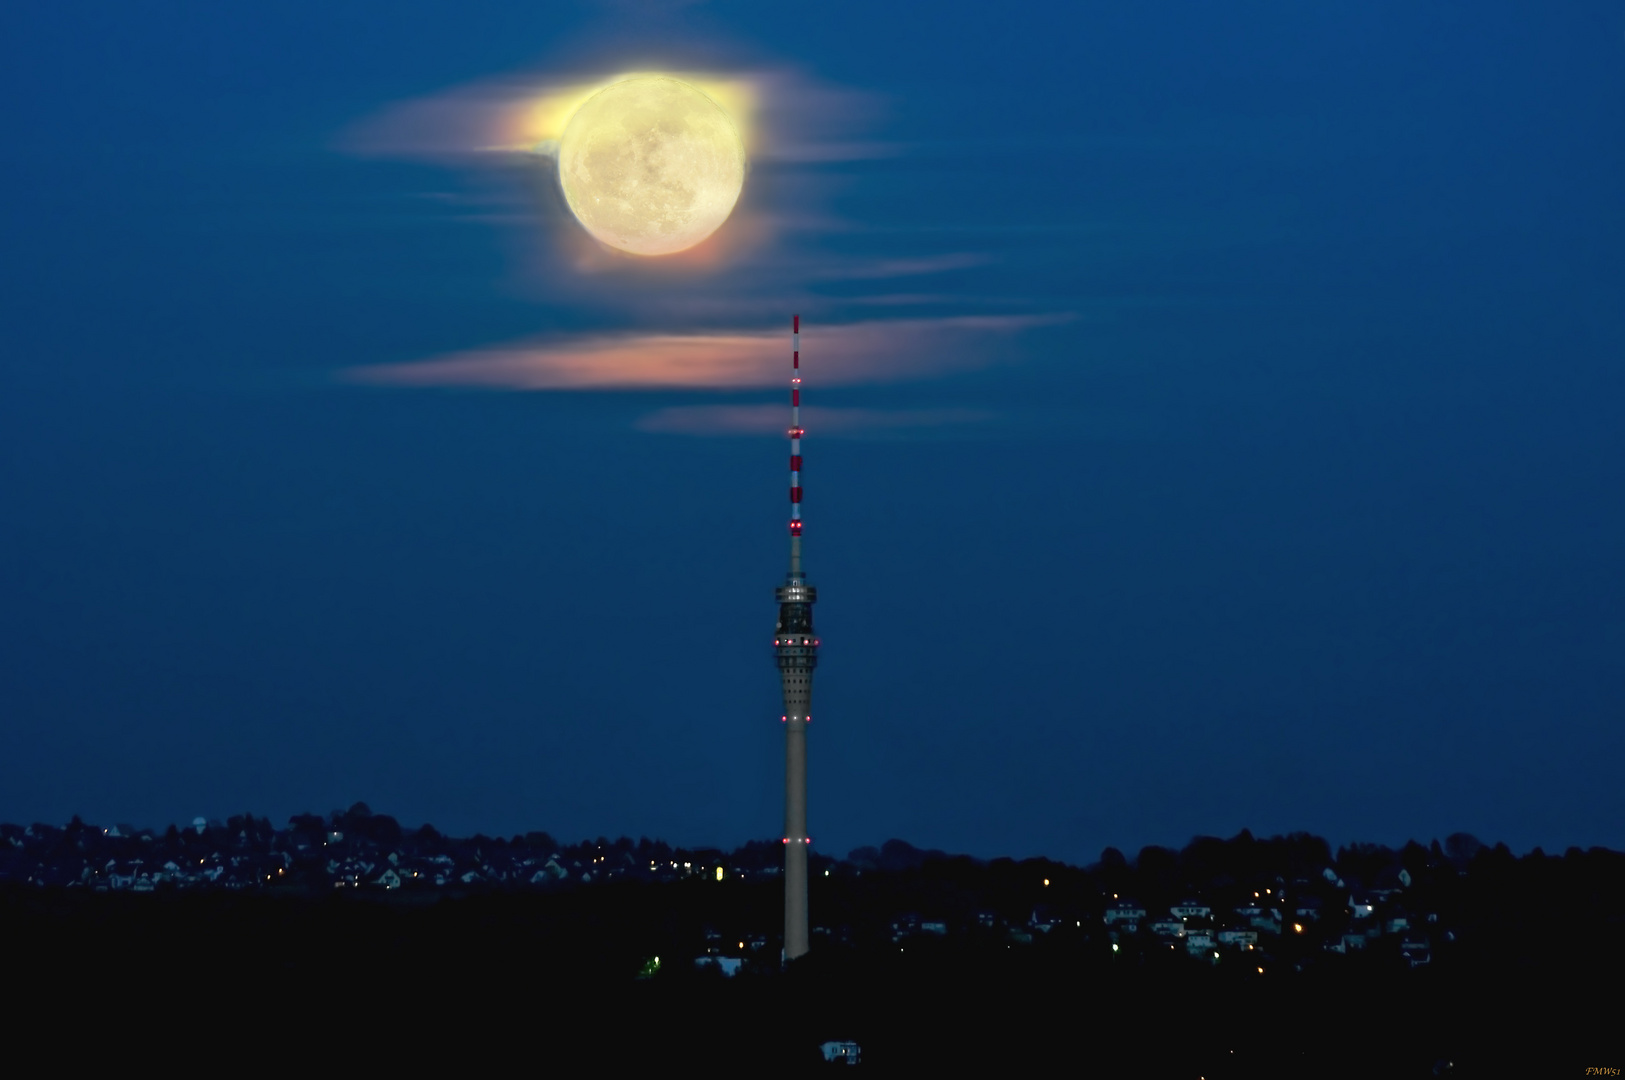 Mond neben Fernsehturm